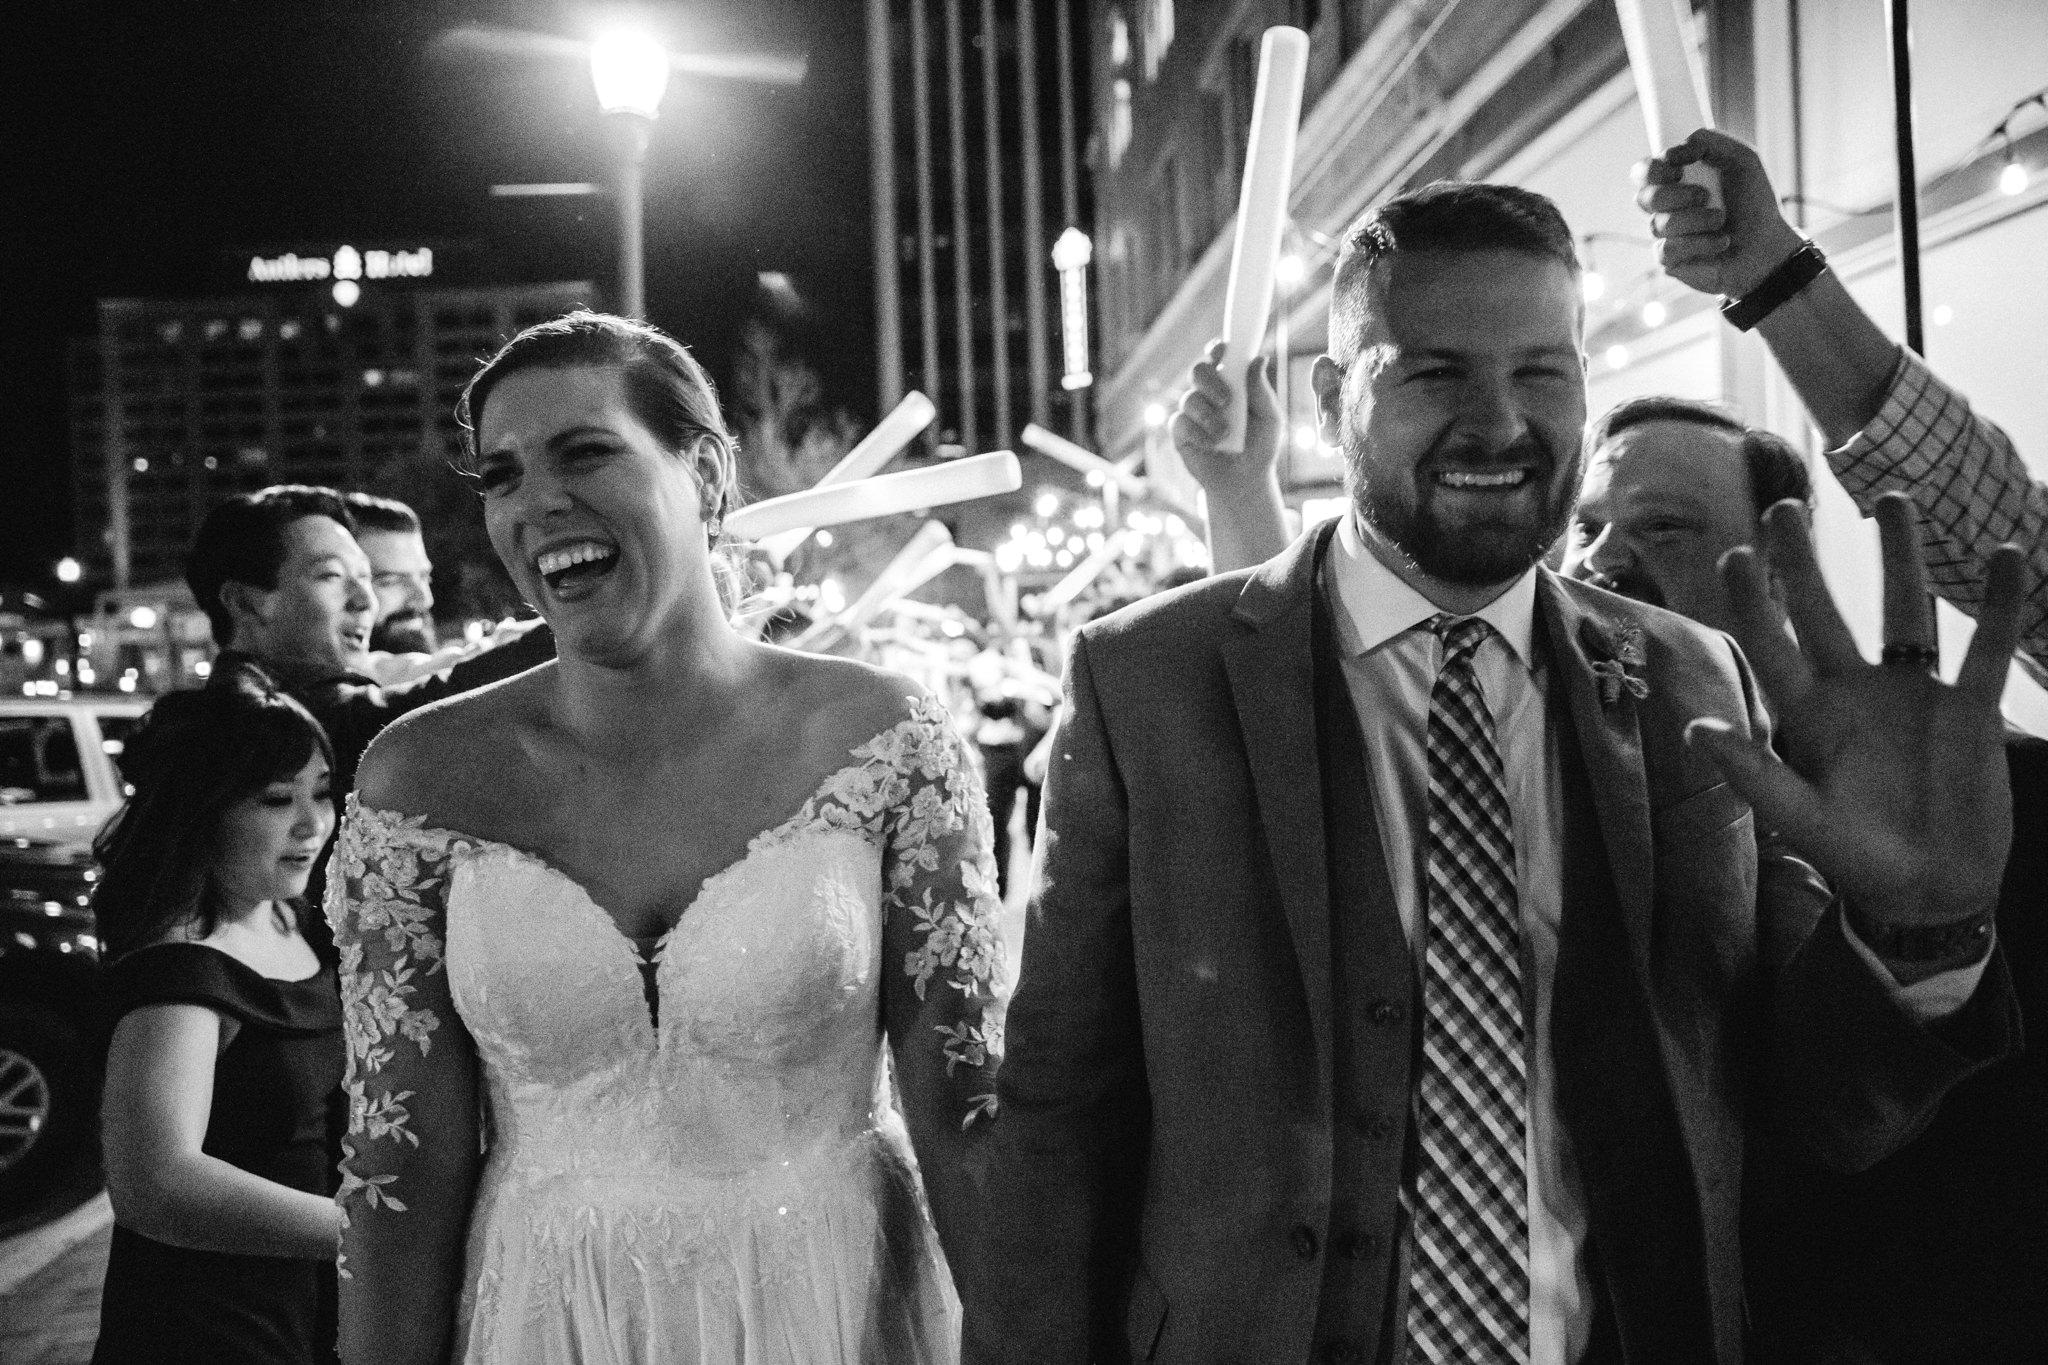 phantom-canyon-brewery-colorado-springs-wedding-photographer-239.jpg